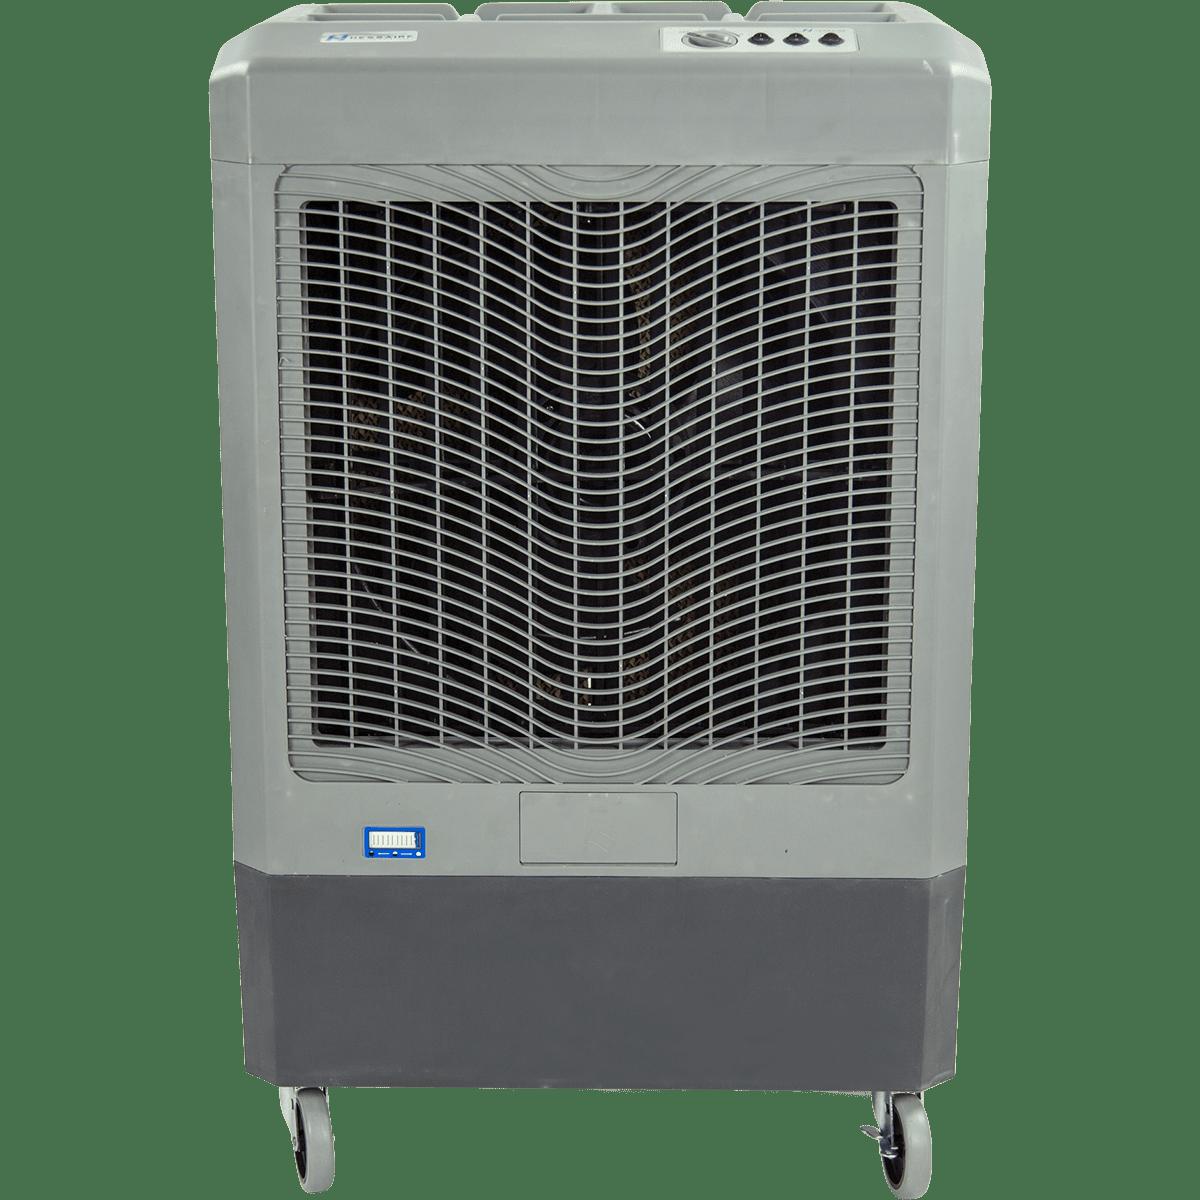 Hessaire MC61M 5,300 CFM 3-Speed Portable Evaporative Cooler he5454